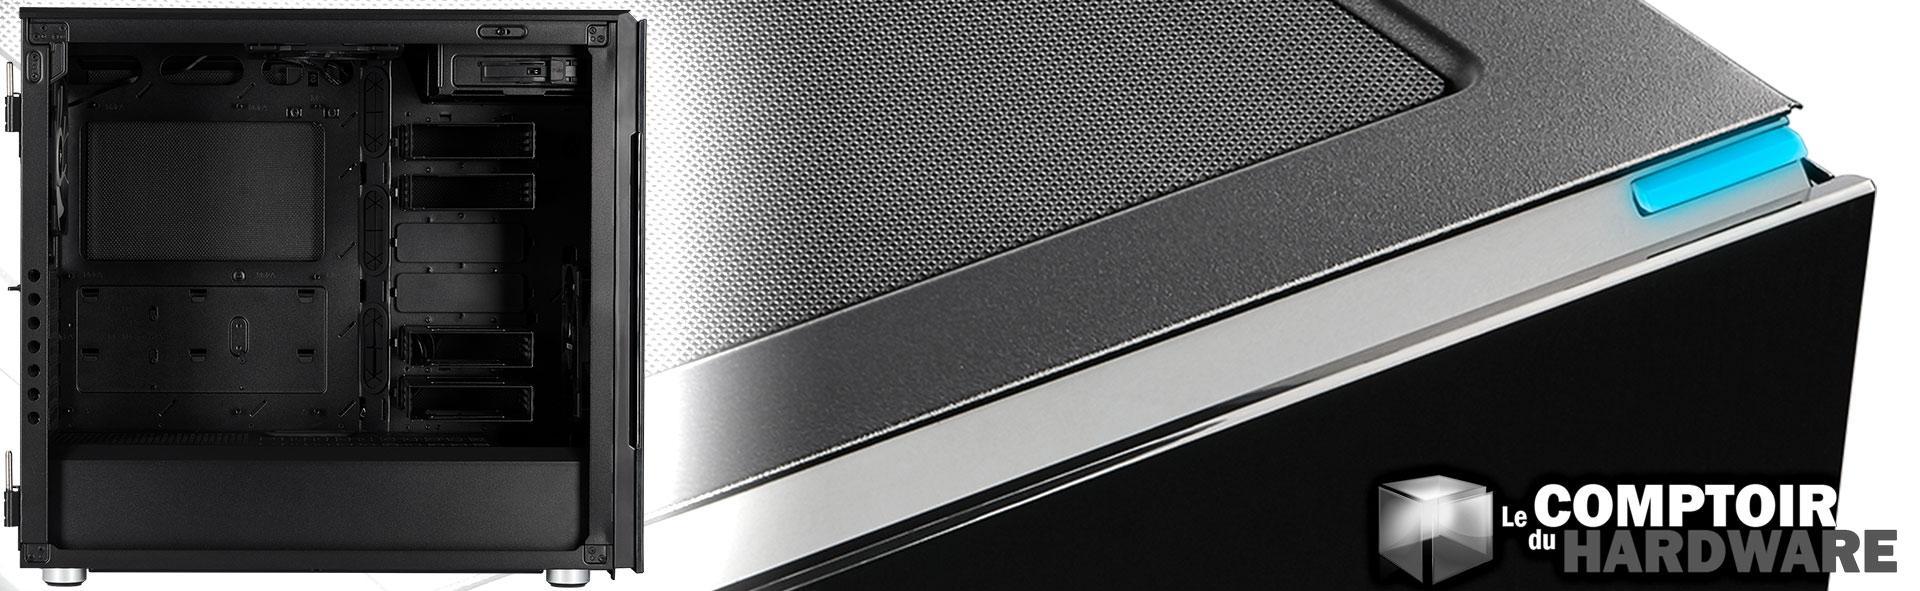 test corsair carbide 678c le comptoir du hardware. Black Bedroom Furniture Sets. Home Design Ideas